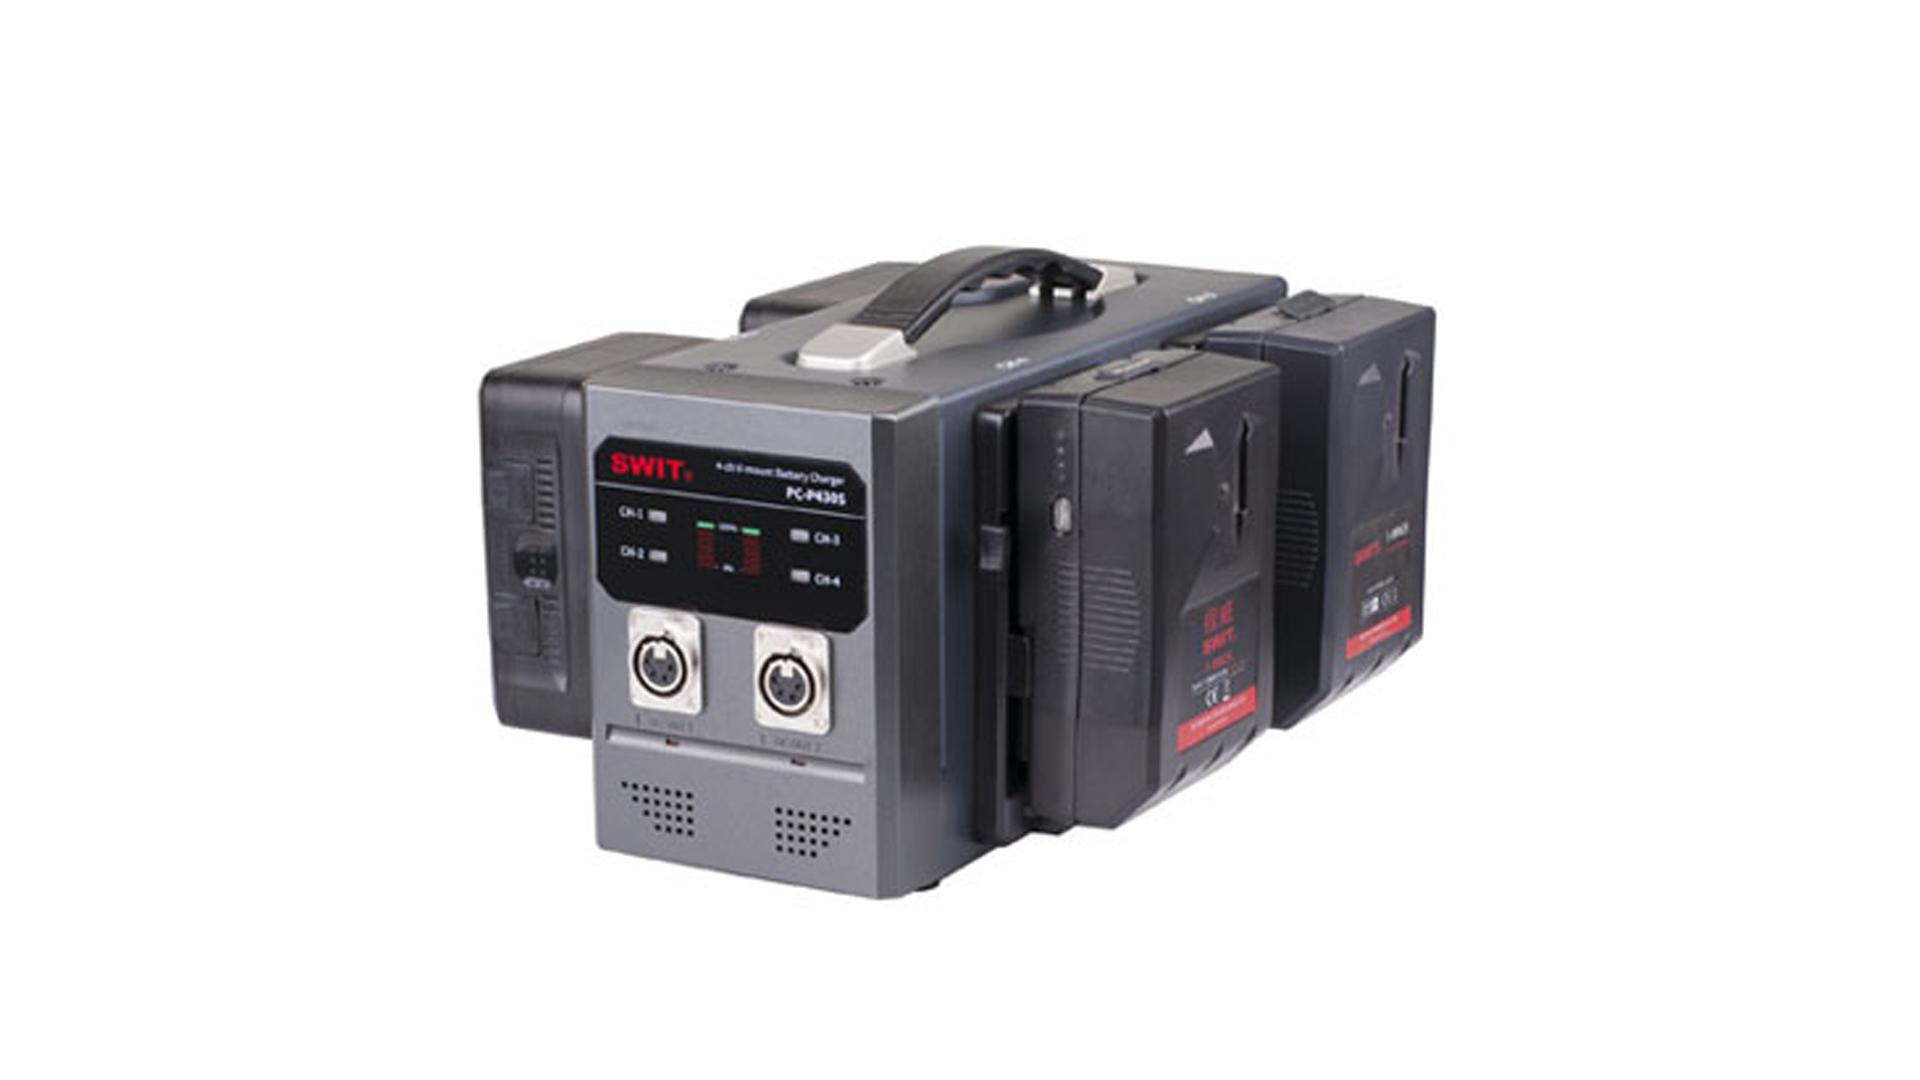 Swit PC P430S | Caricabatterie Swit quadruplo per batterie V lock | Batterie V Lock